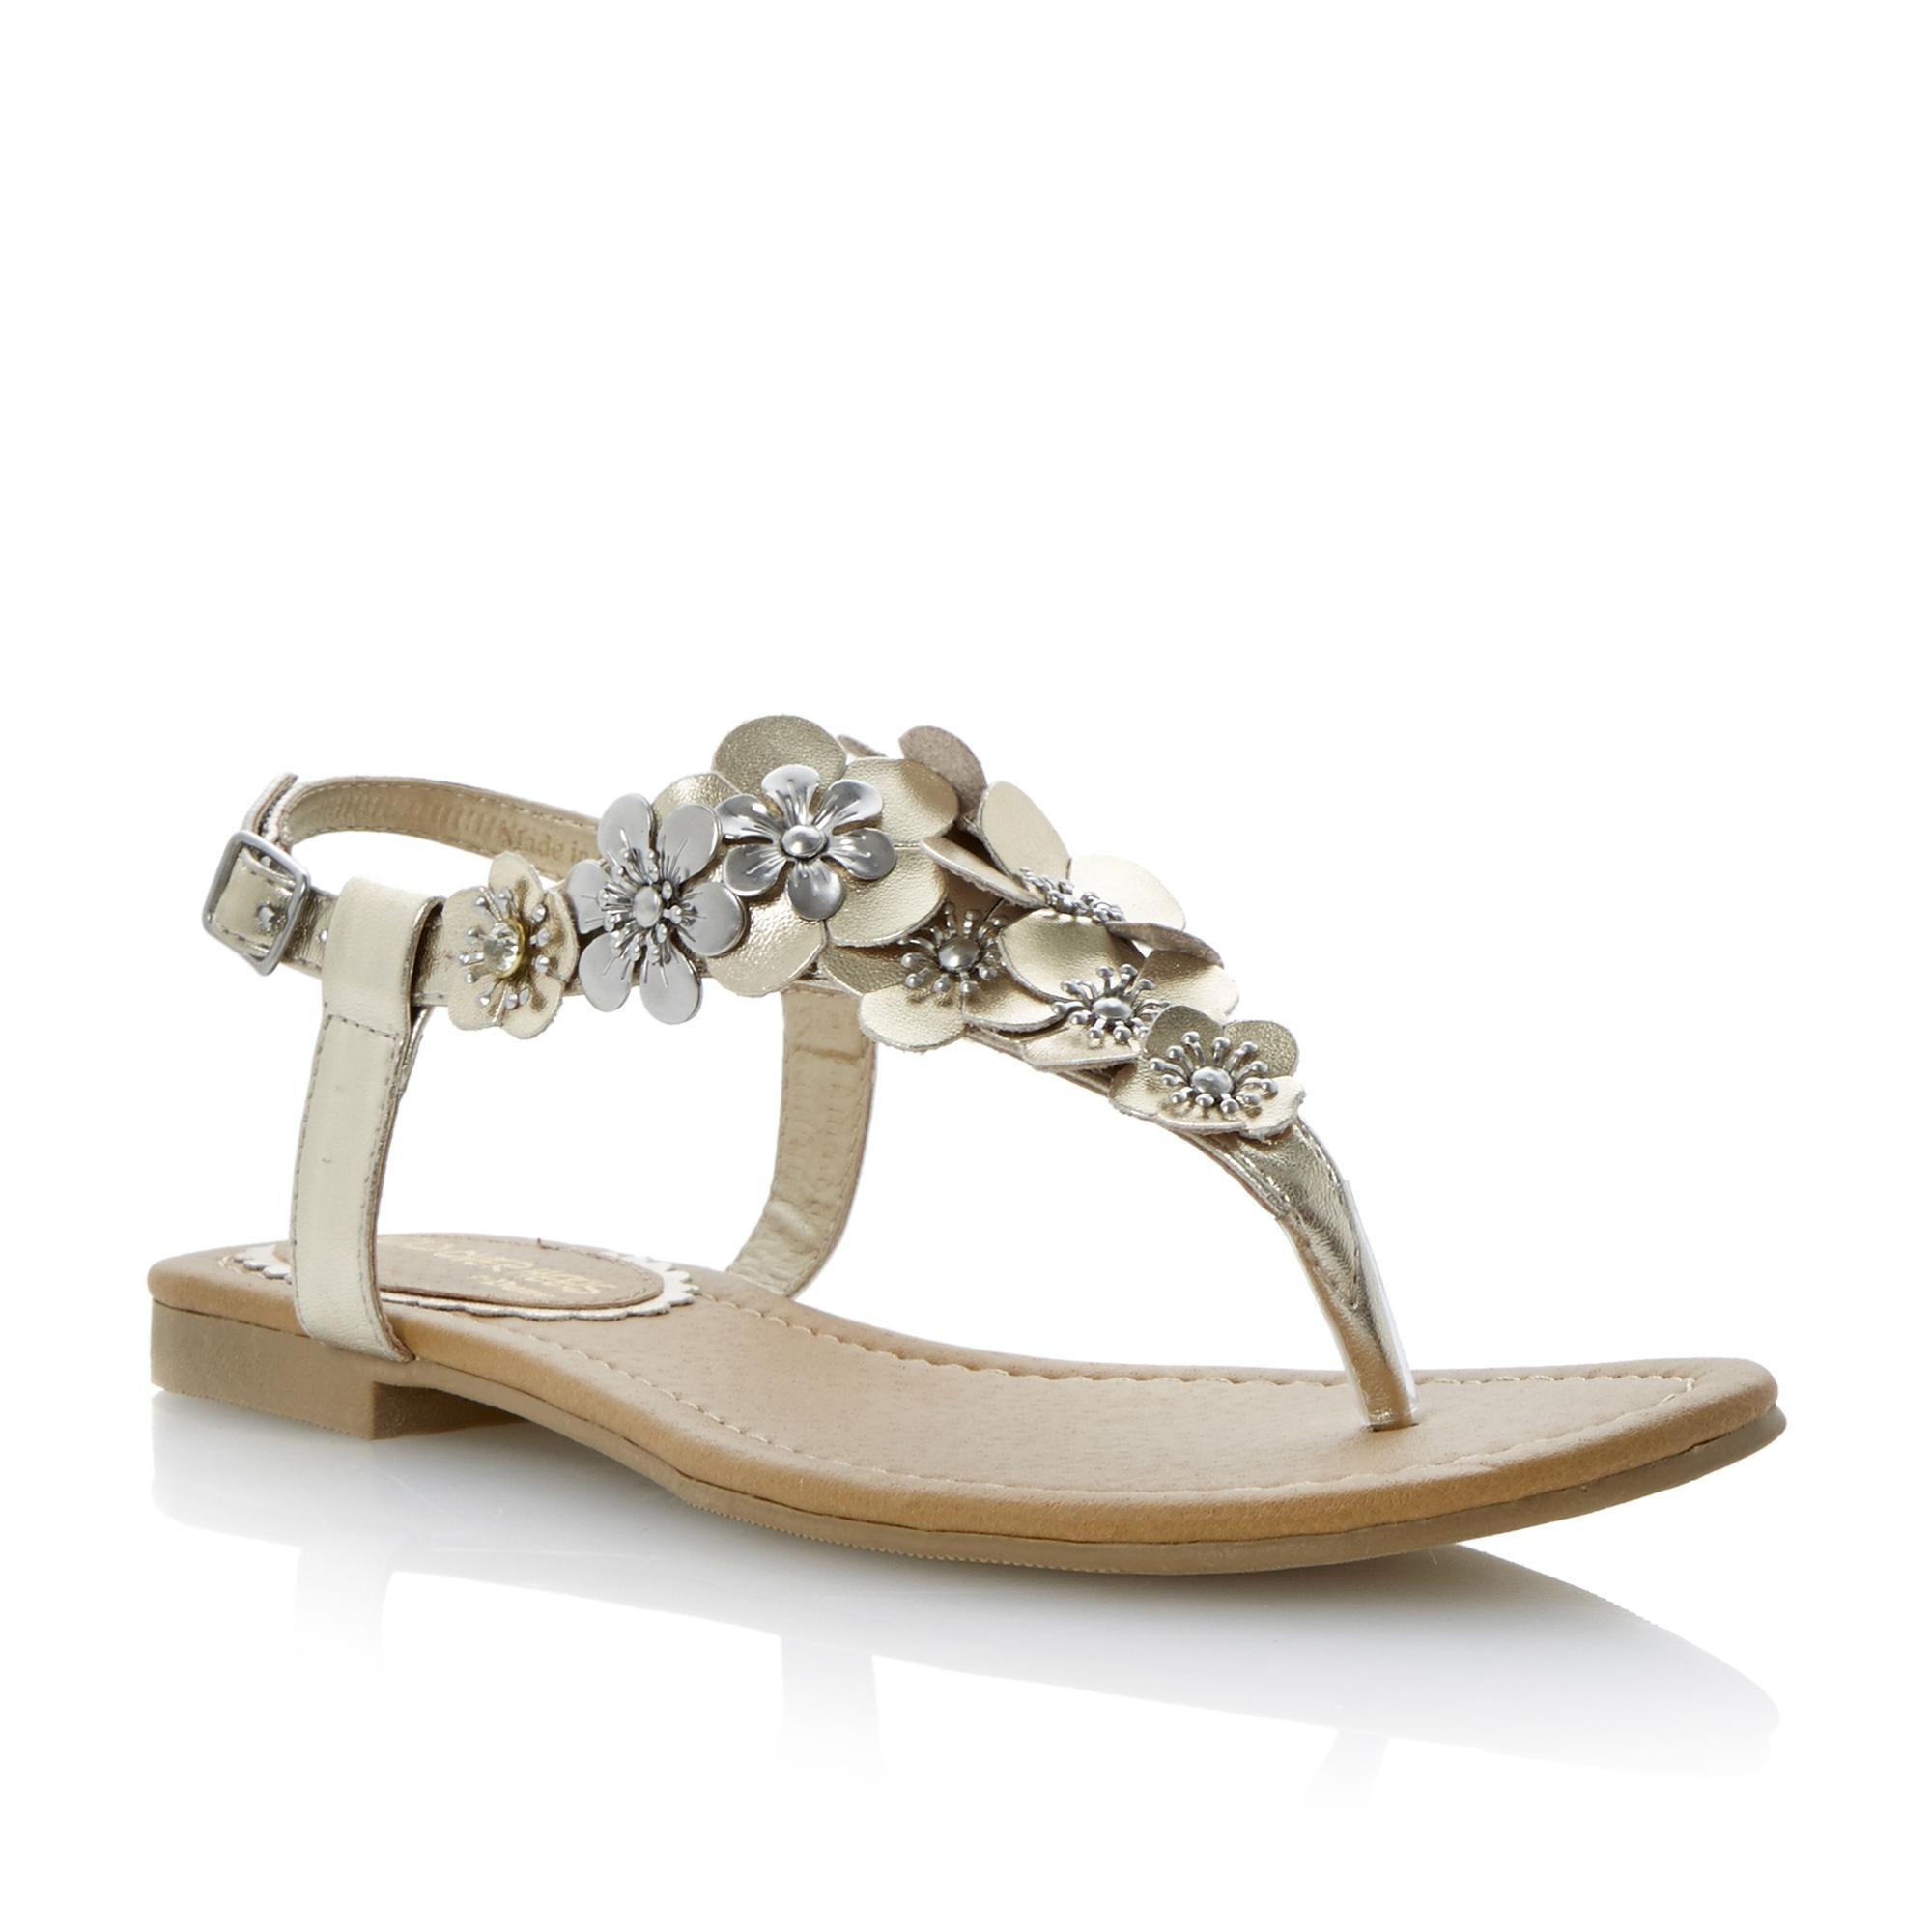 88a2677f313783 Head Over Heels Ladies Metallic HONEYCOMB - Flower Detail Toe Post Sandal